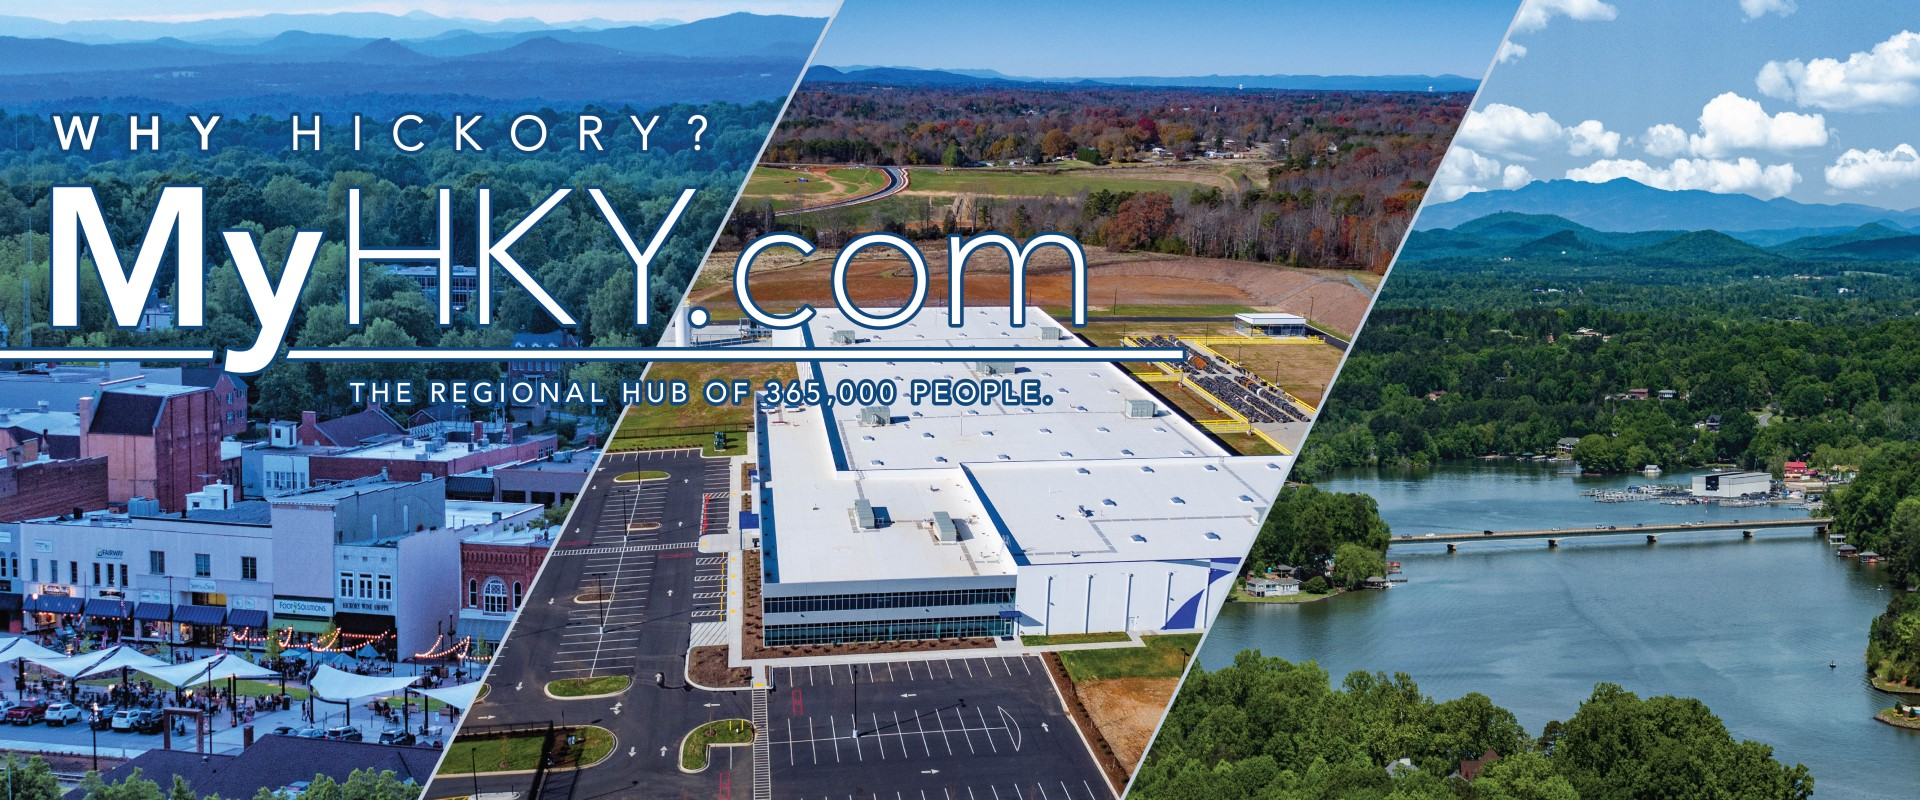 MyHKY.com